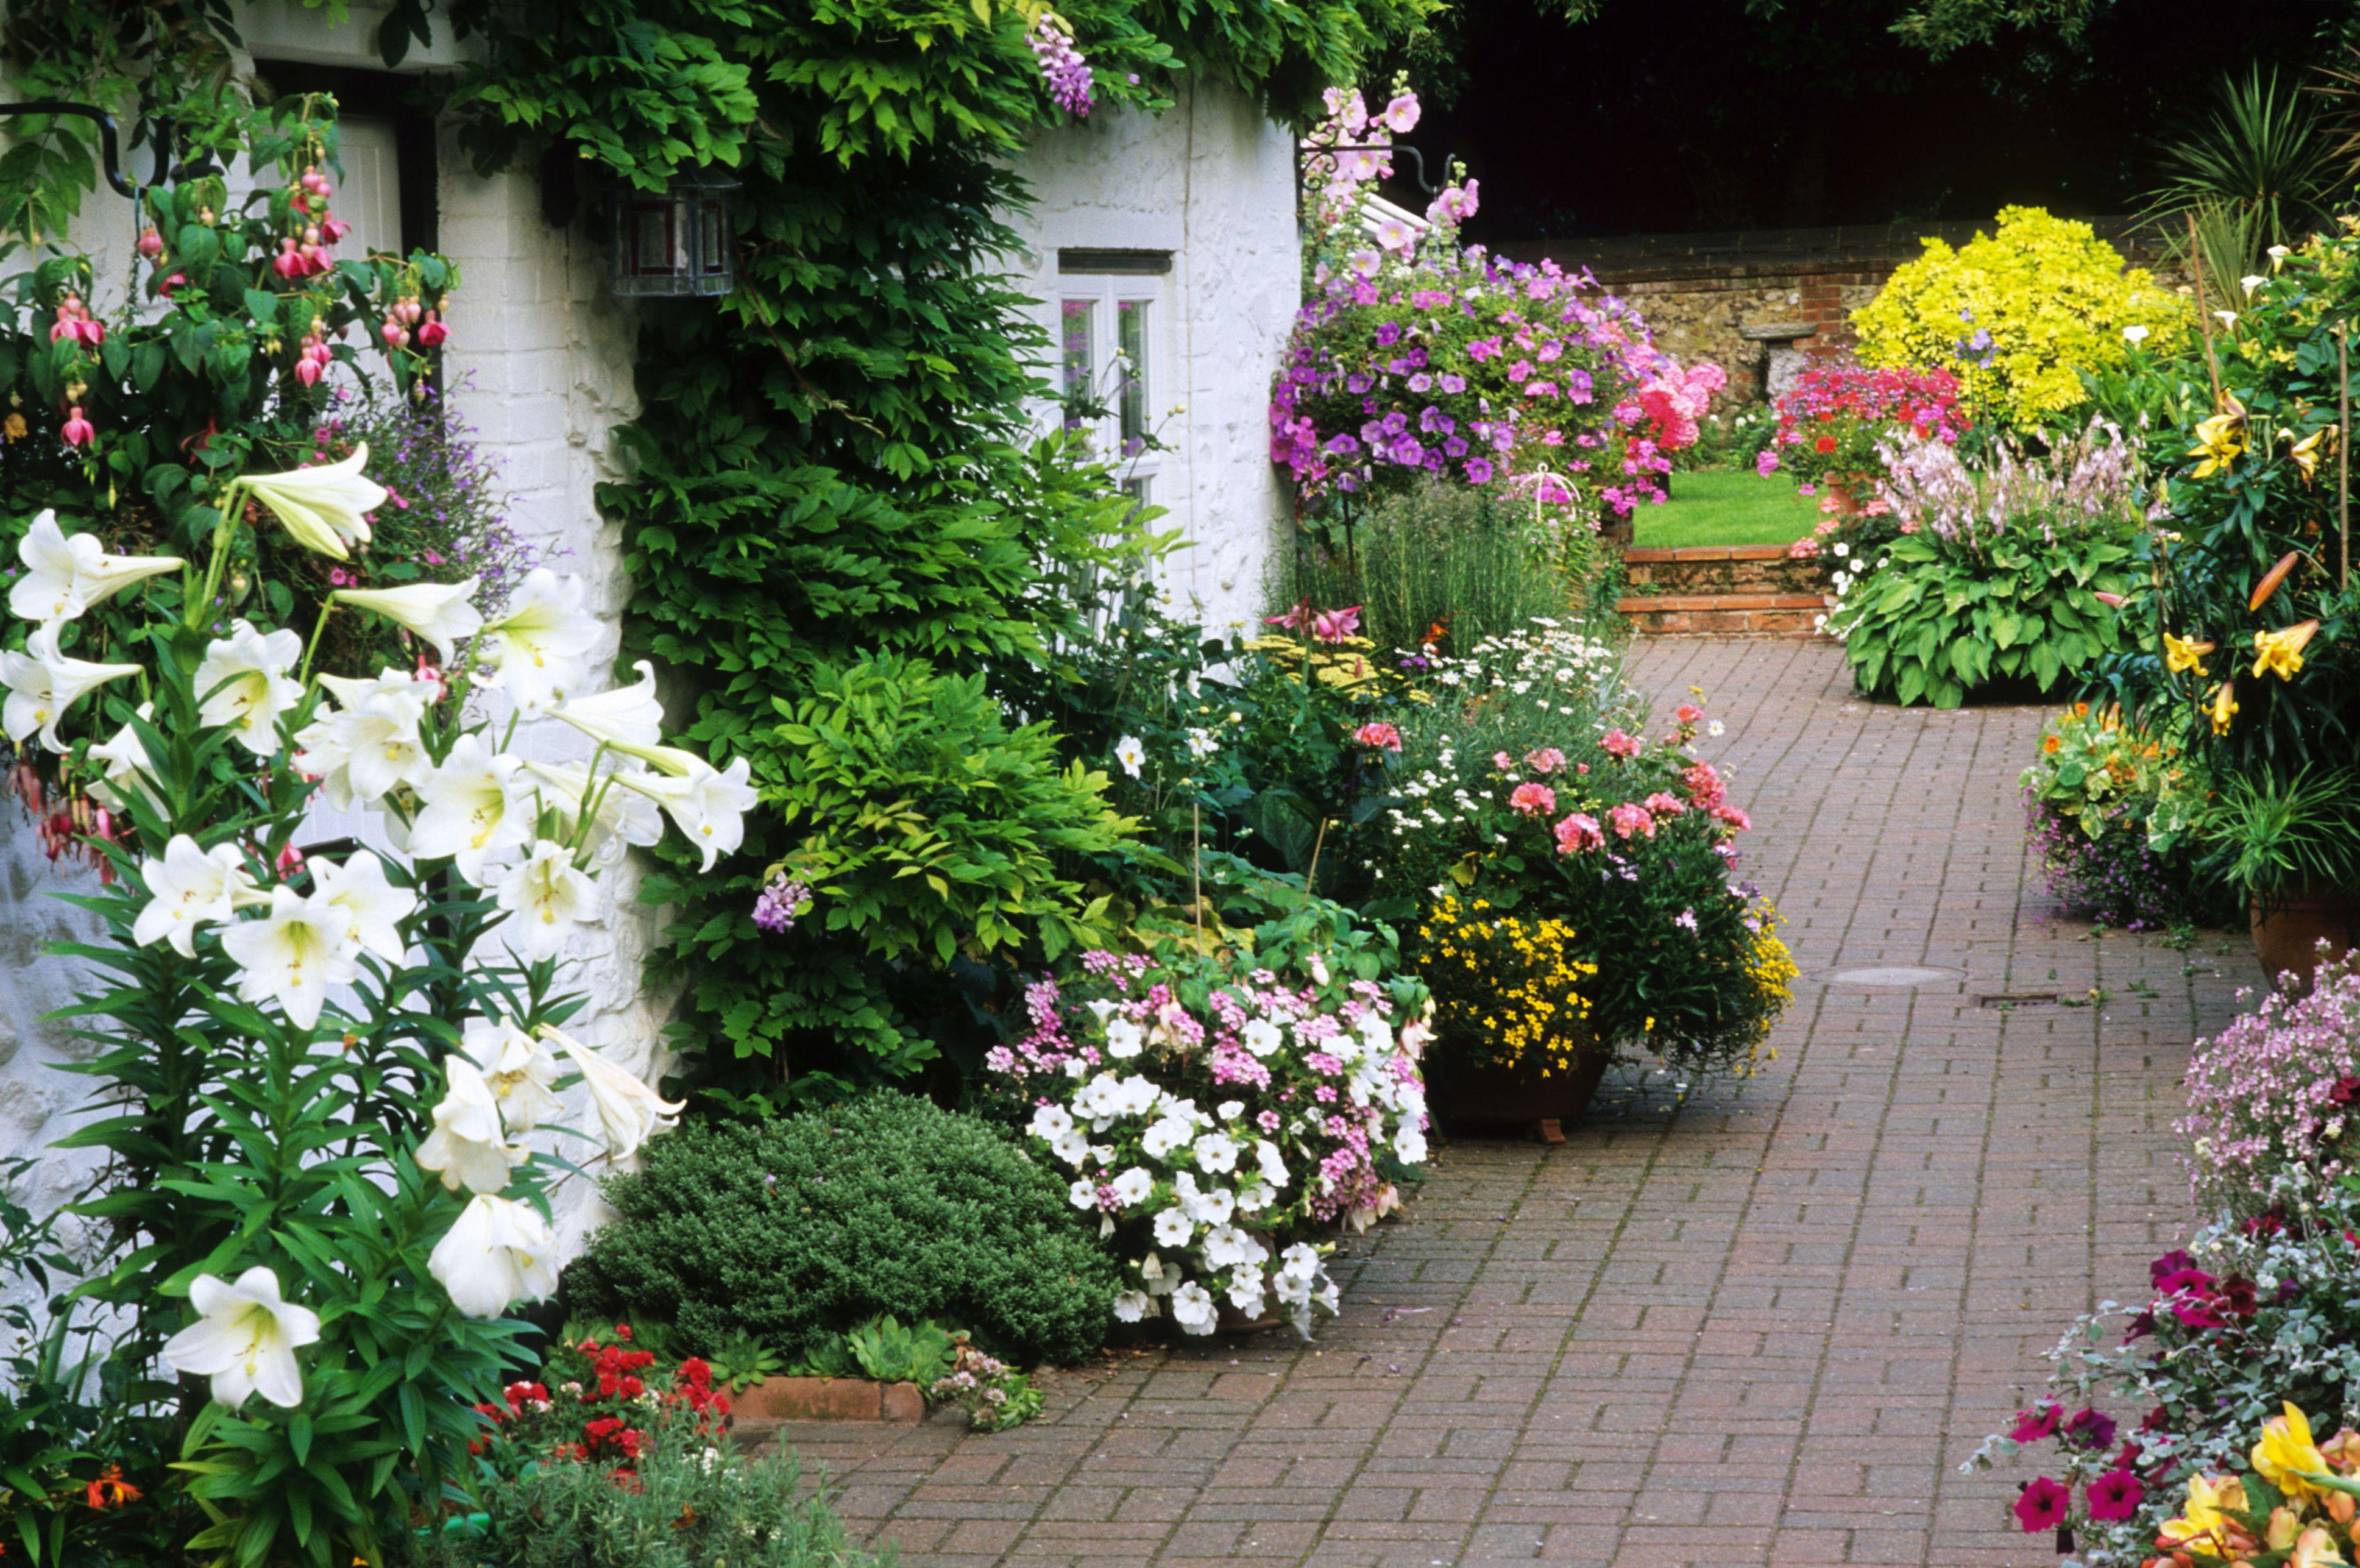 7 Flower Garden Designs You'll Love on Cottage Patio Ideas id=53158